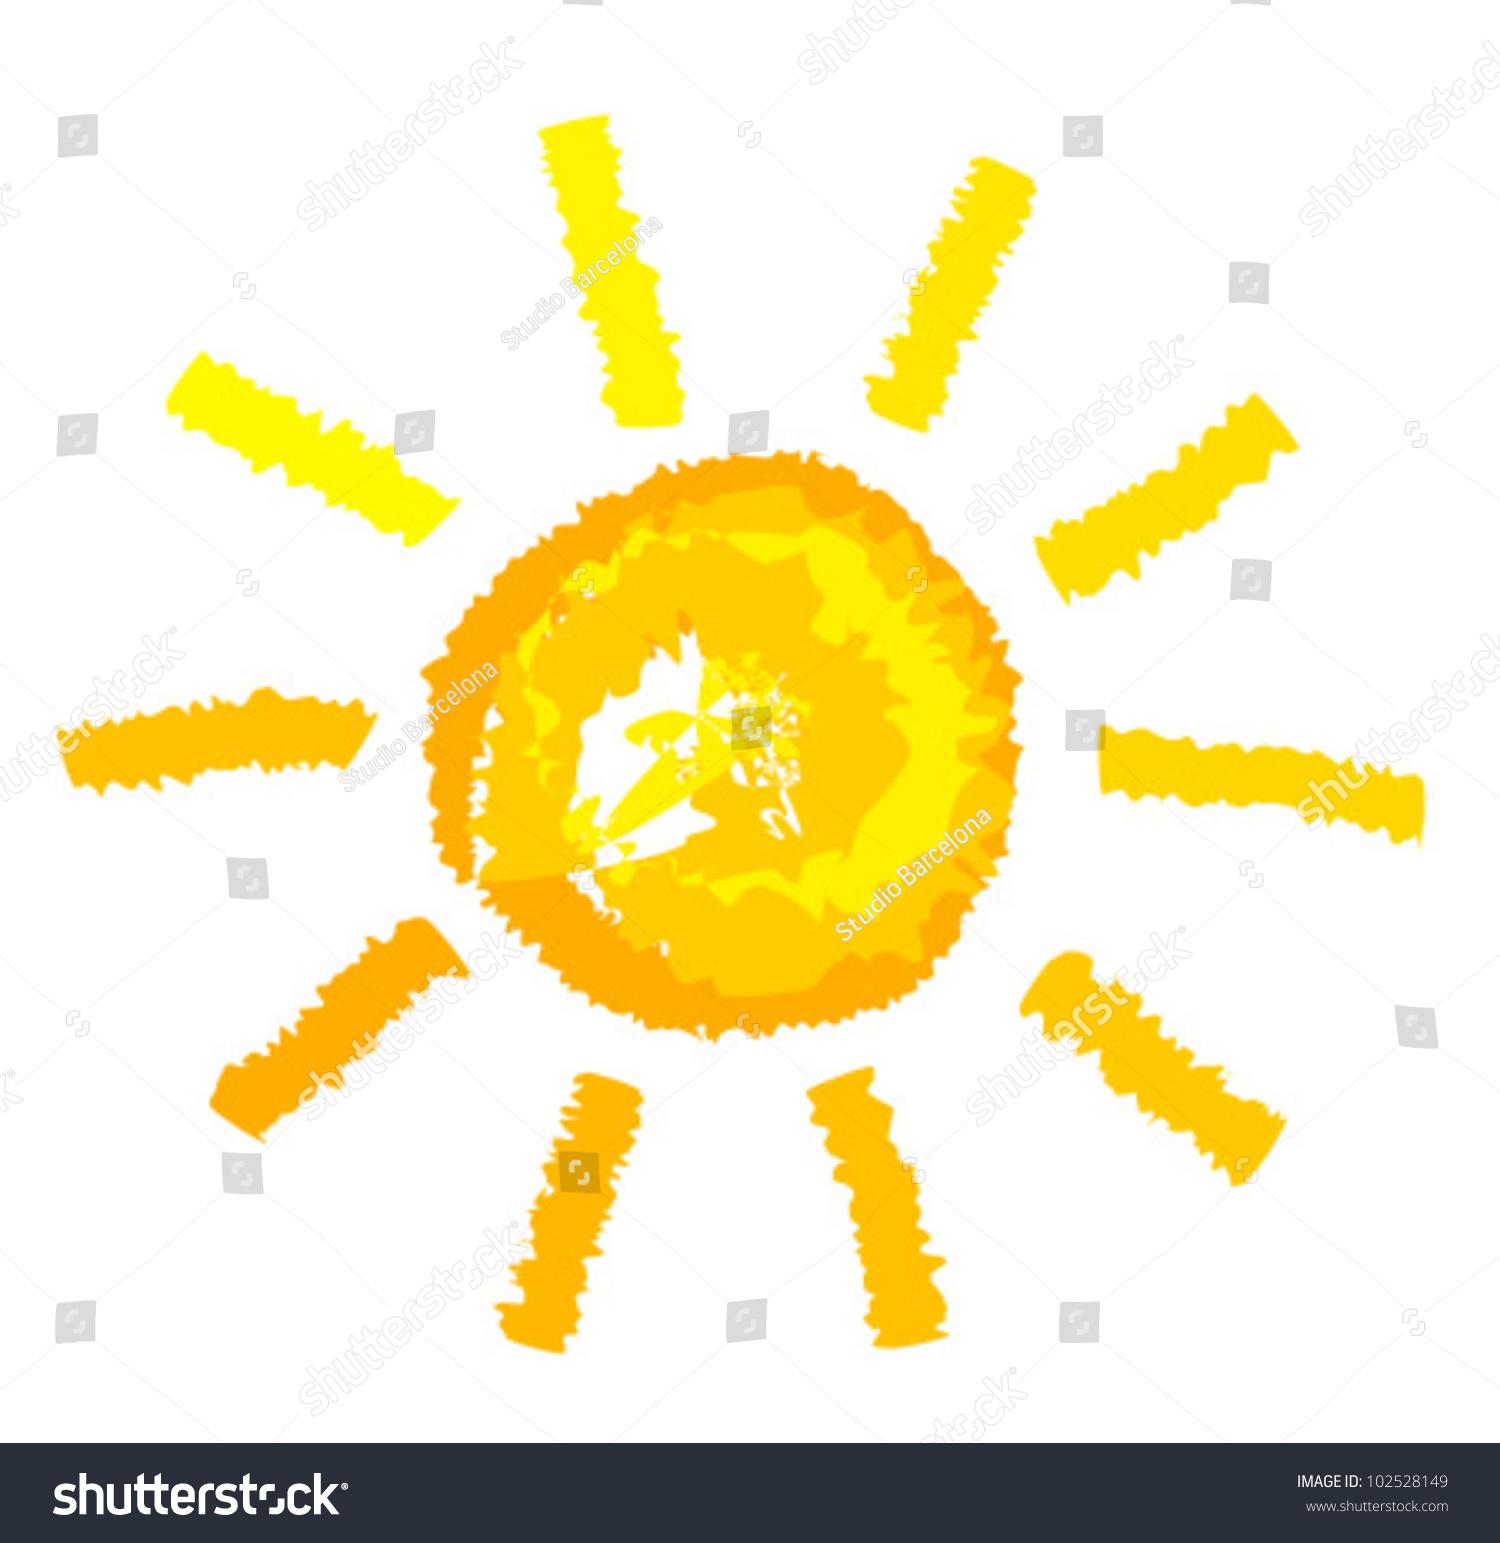 Uncategorized Sun Drawing sun drawing vector illustration stock 102528149 shutterstock illustration